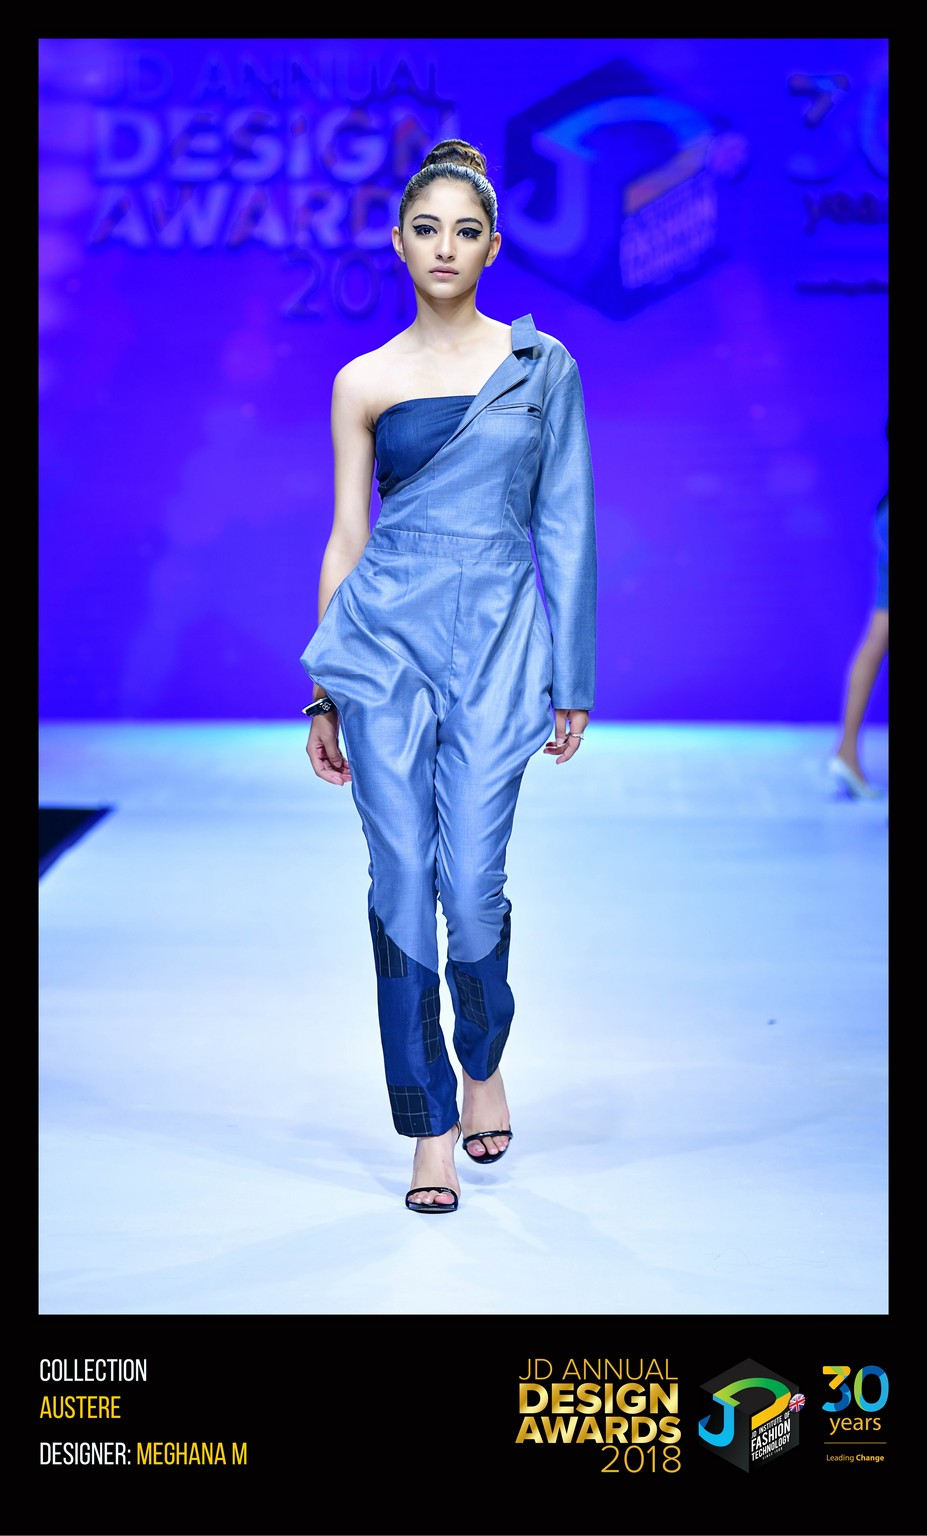 Austere – Change – JD Annual Design Awards 2018 | Designer: Meghana | Photography : Jerin Nath (@jerin_nath) austere Austere – Change – JD Annual Design Awards 2018 AUSTERE5